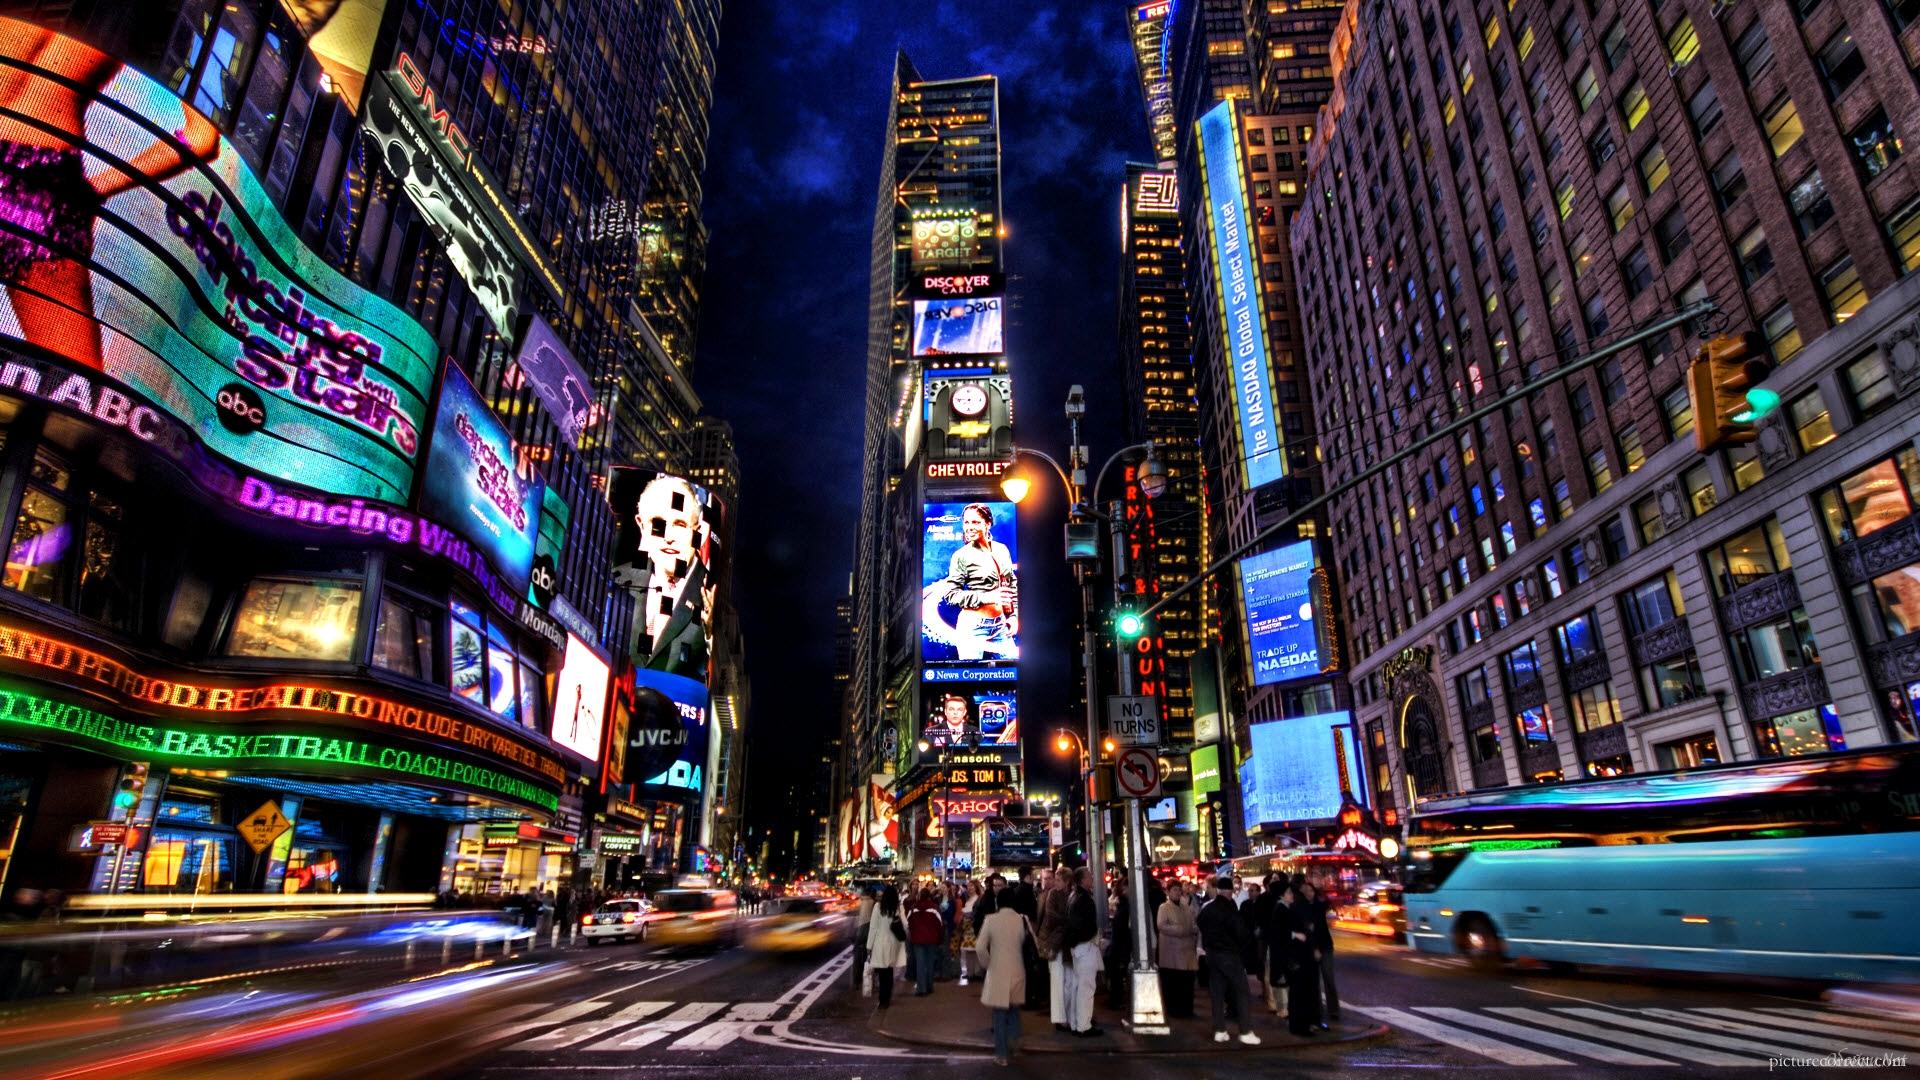 New York City at night wallpaper HD Desktop Wallpaper 1920x1080